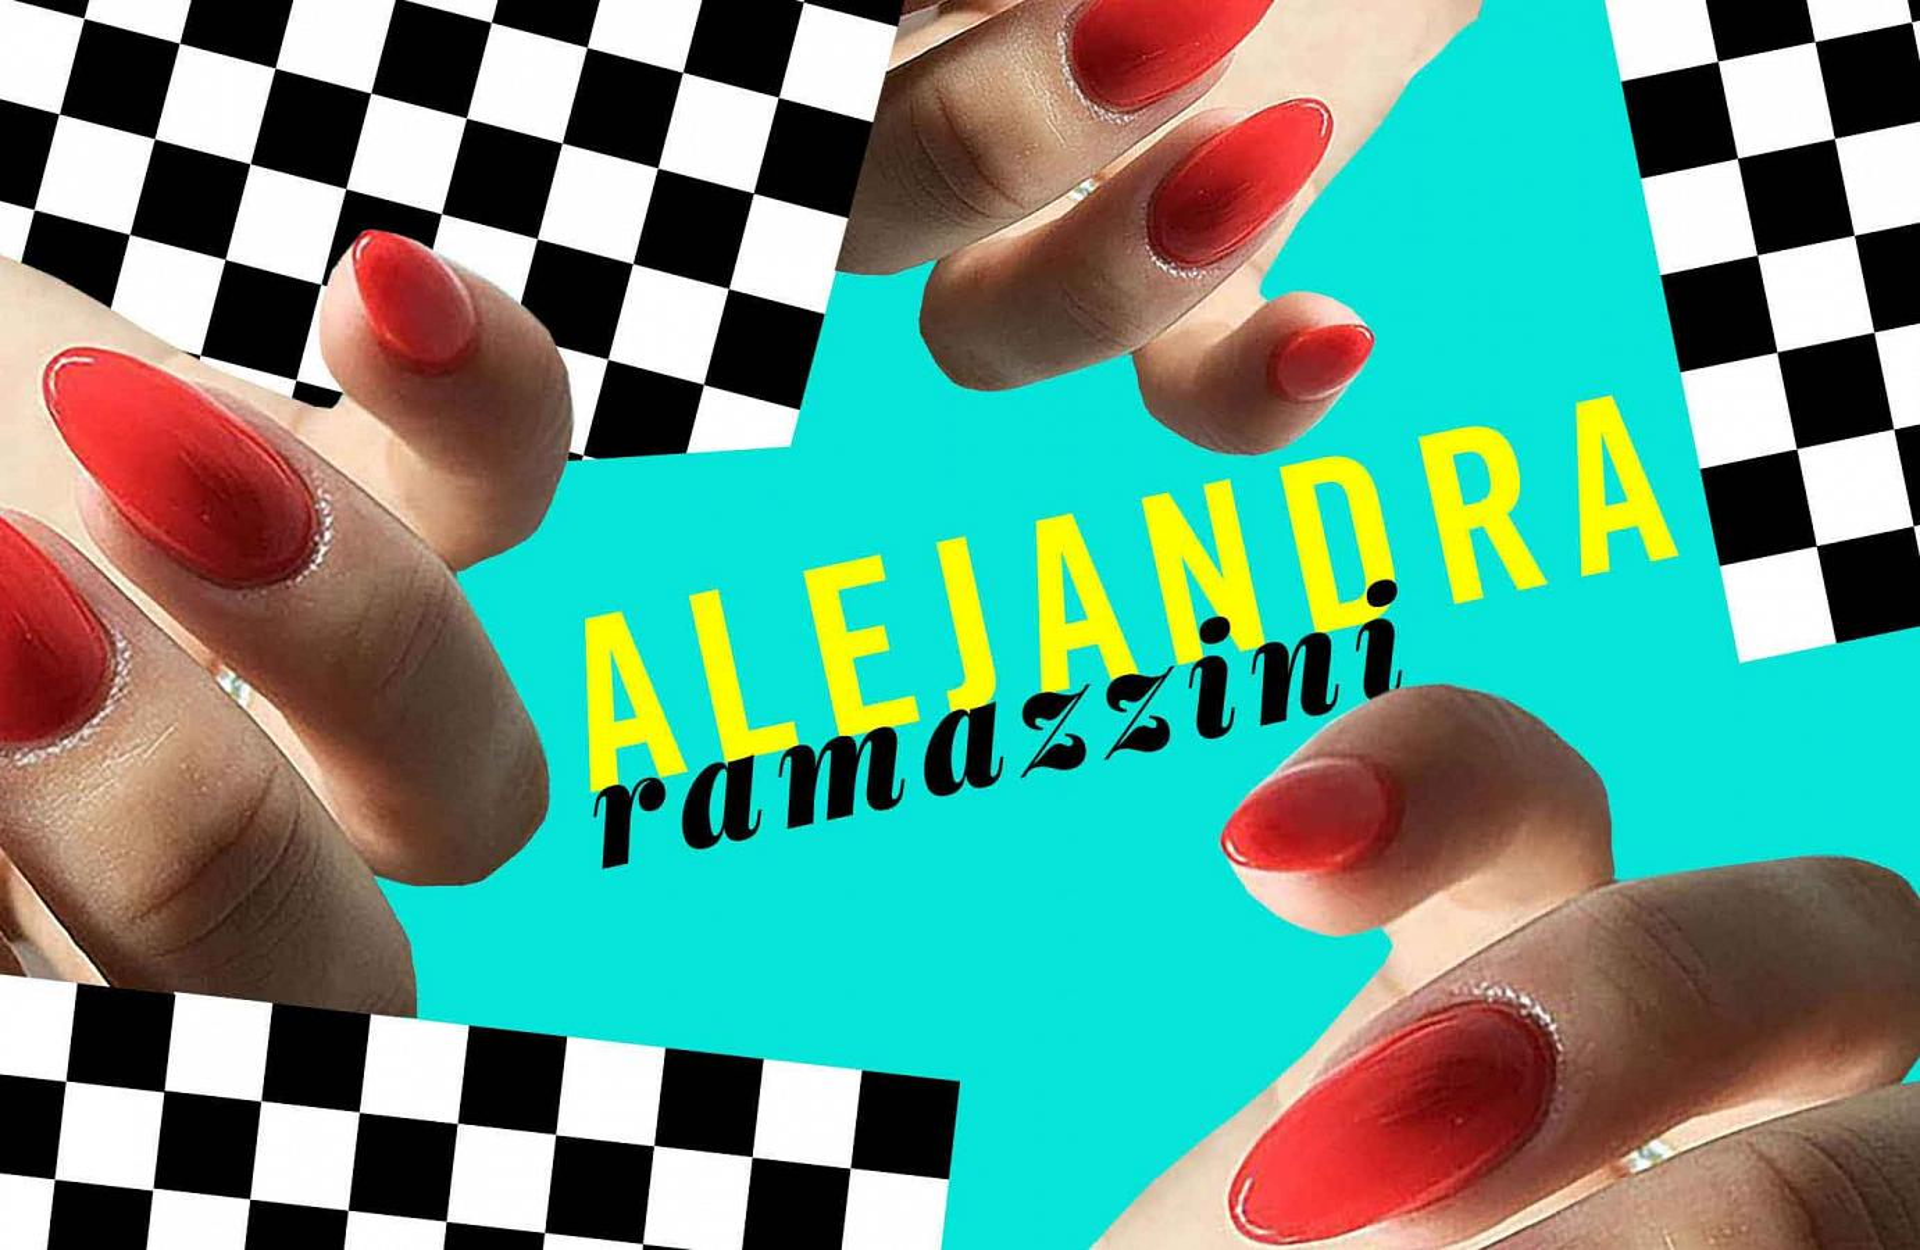 Nail'n it: Alejandra Ramazzini on Life as a Nail Studio Instructor and her thriving Bodega Nails Studio